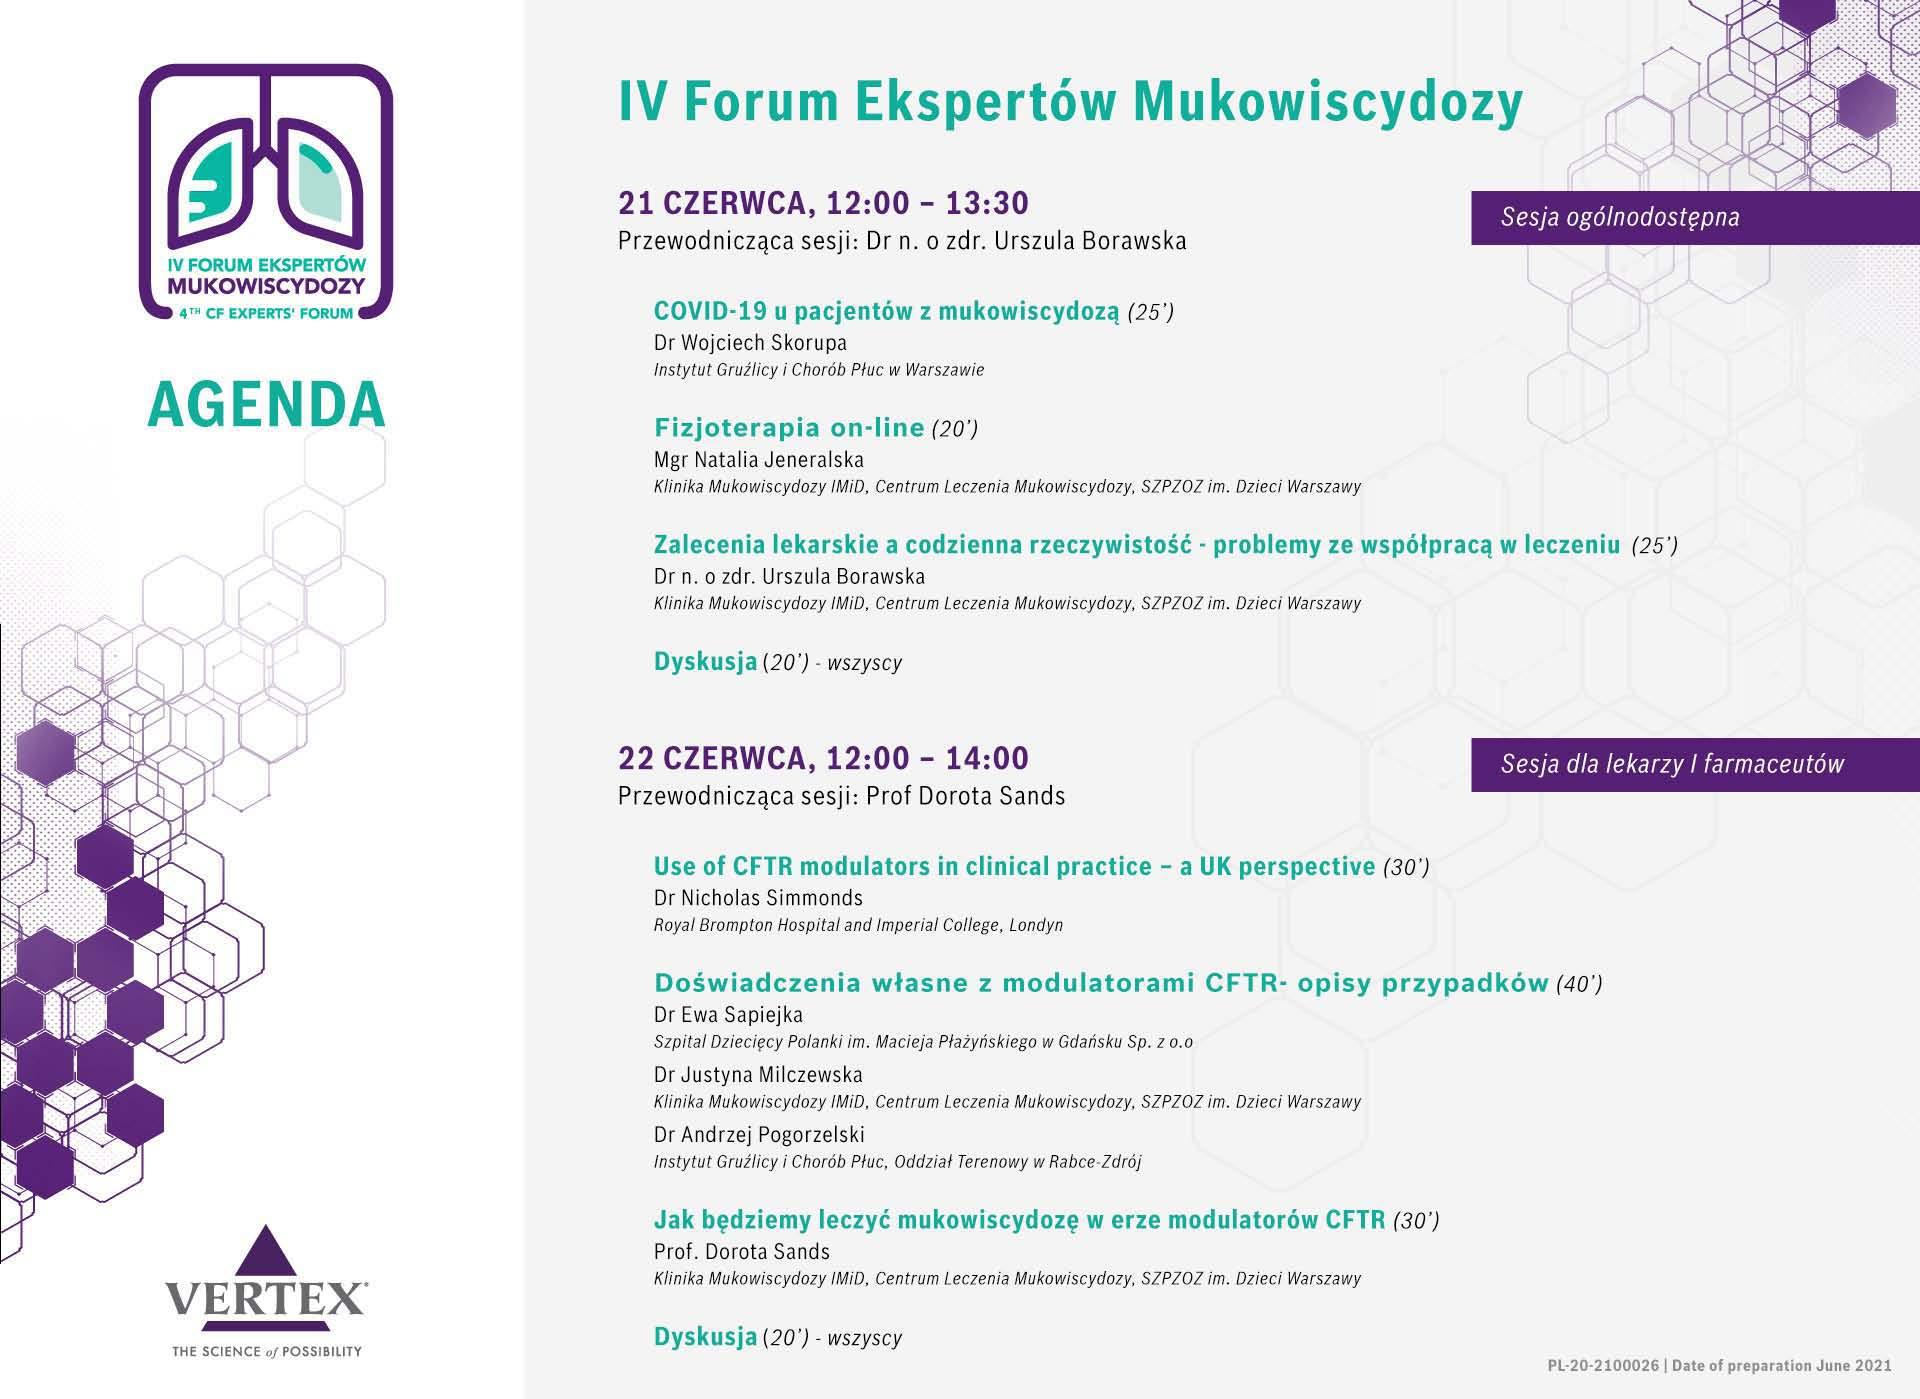 IV Forum Ekspertów Mukowiscydozy